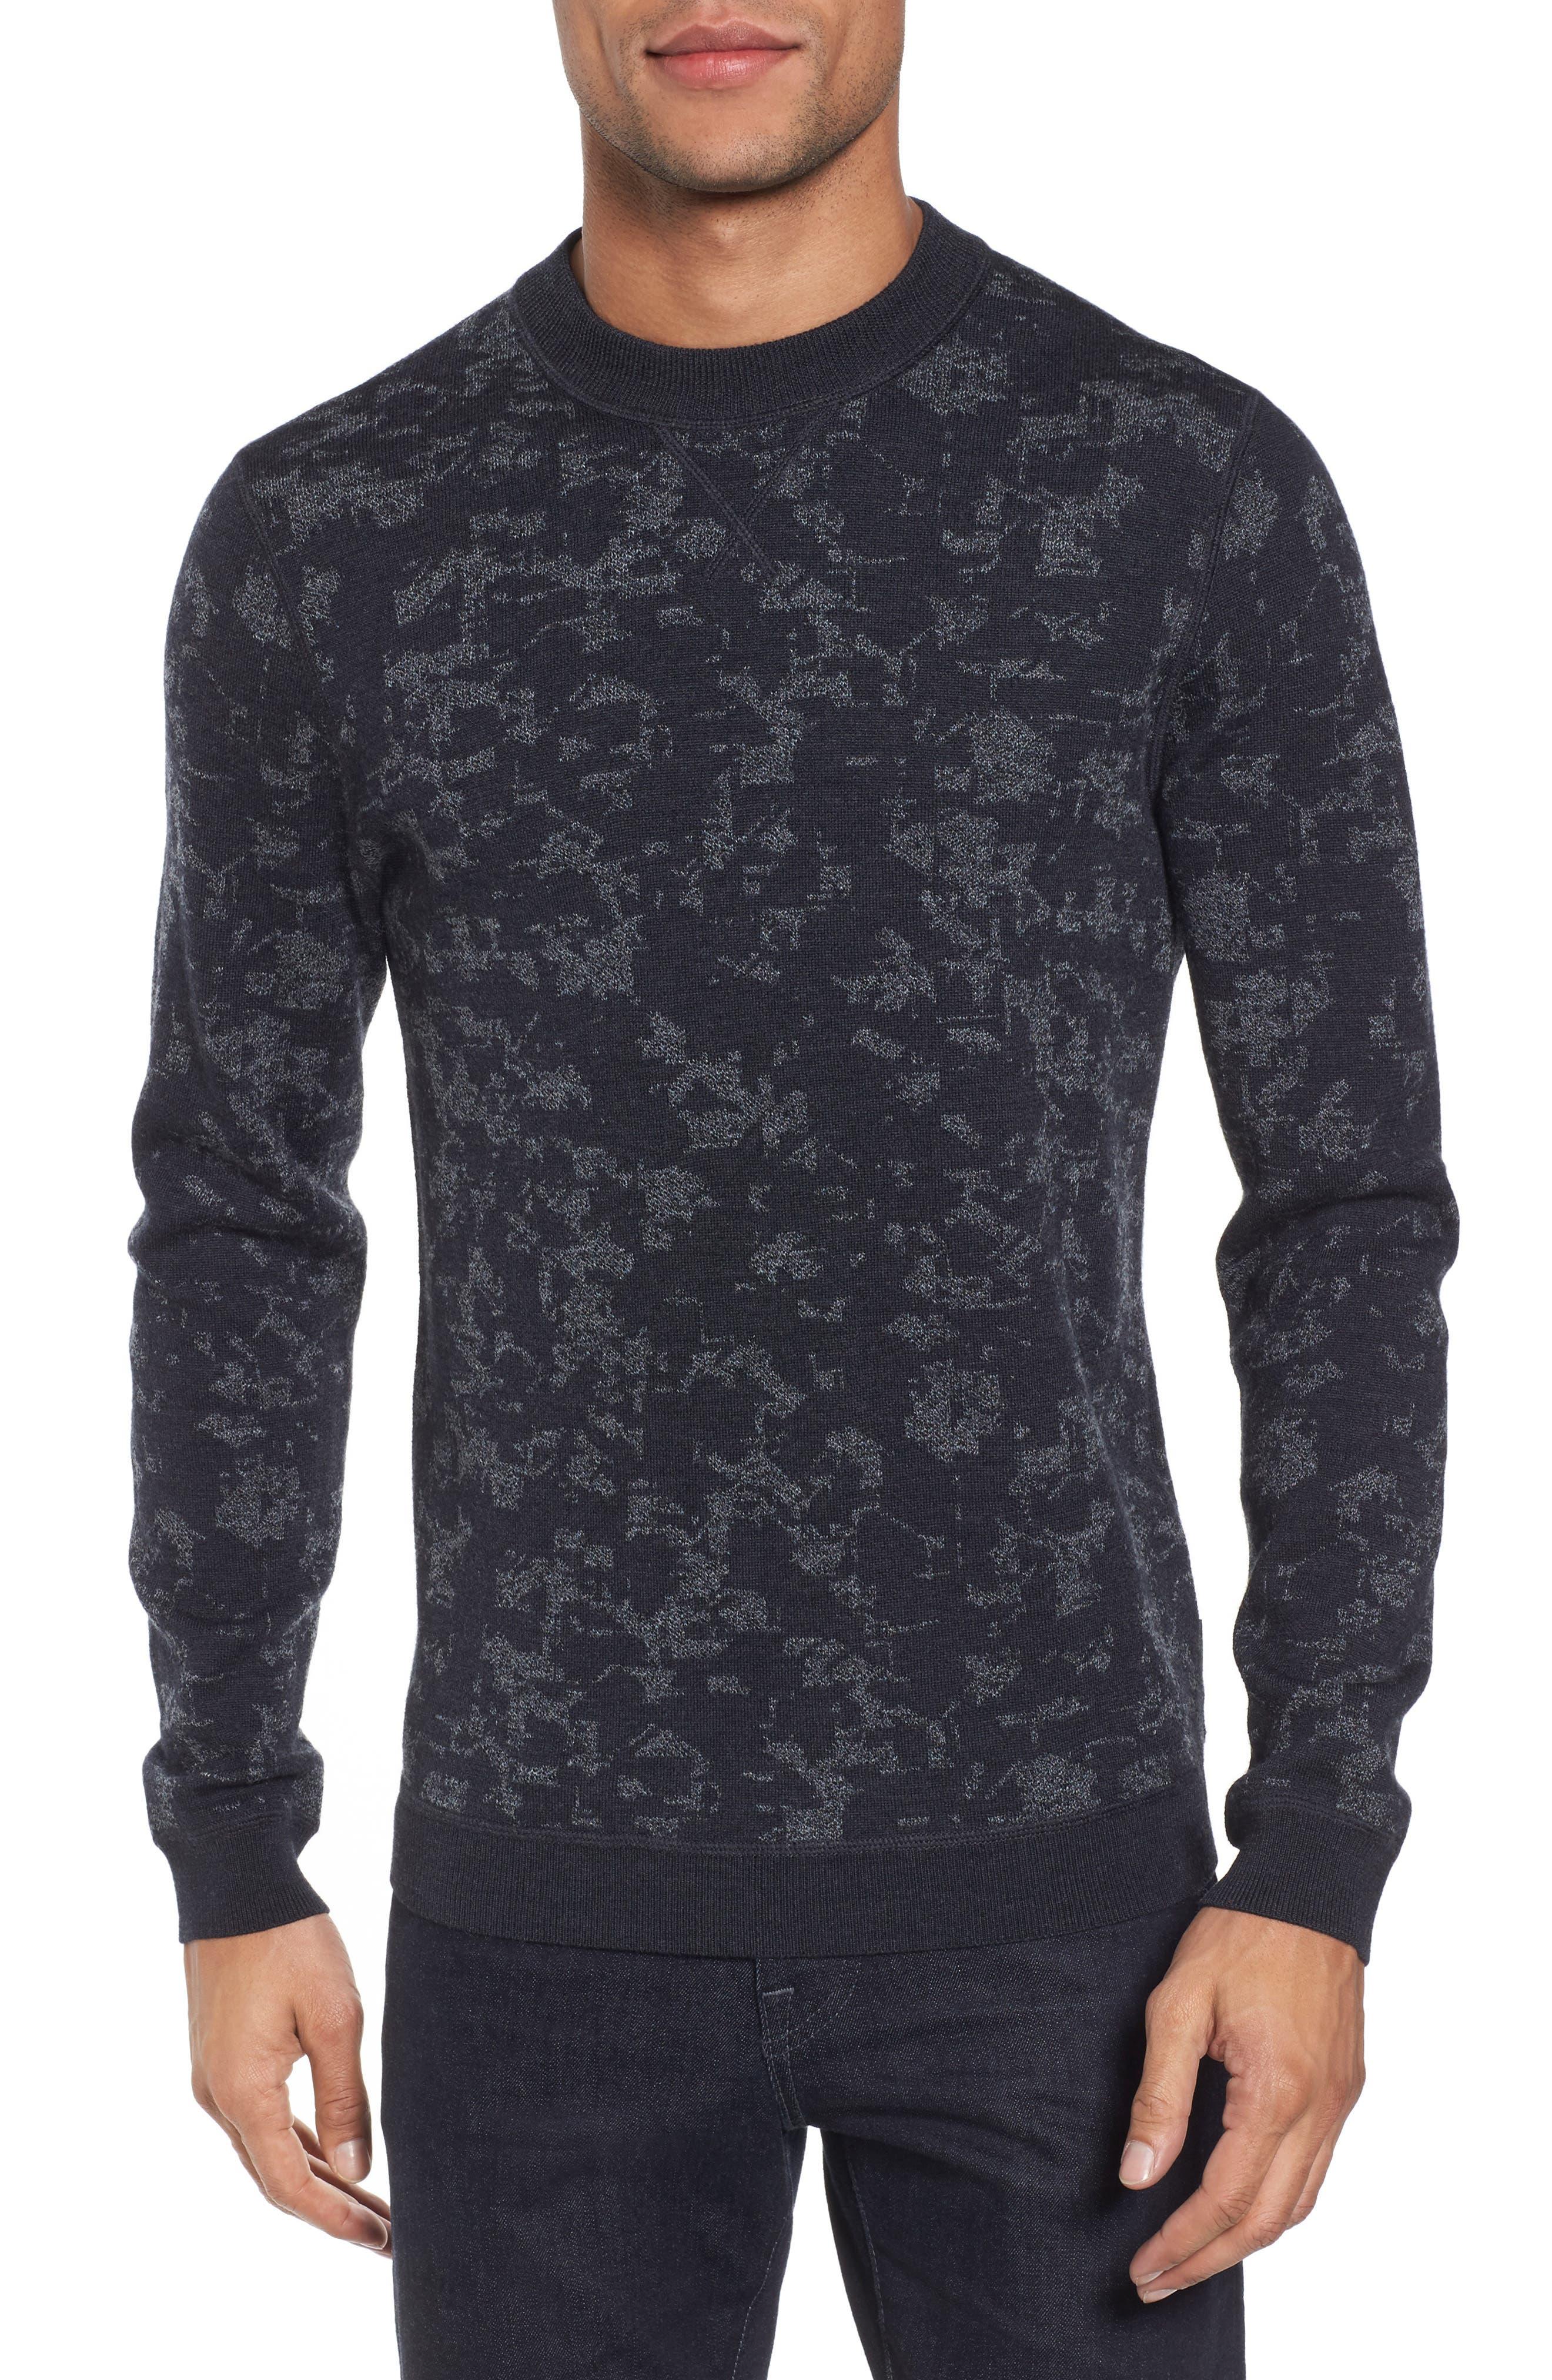 Gelato Jacquard Sweater,                         Main,                         color, 020